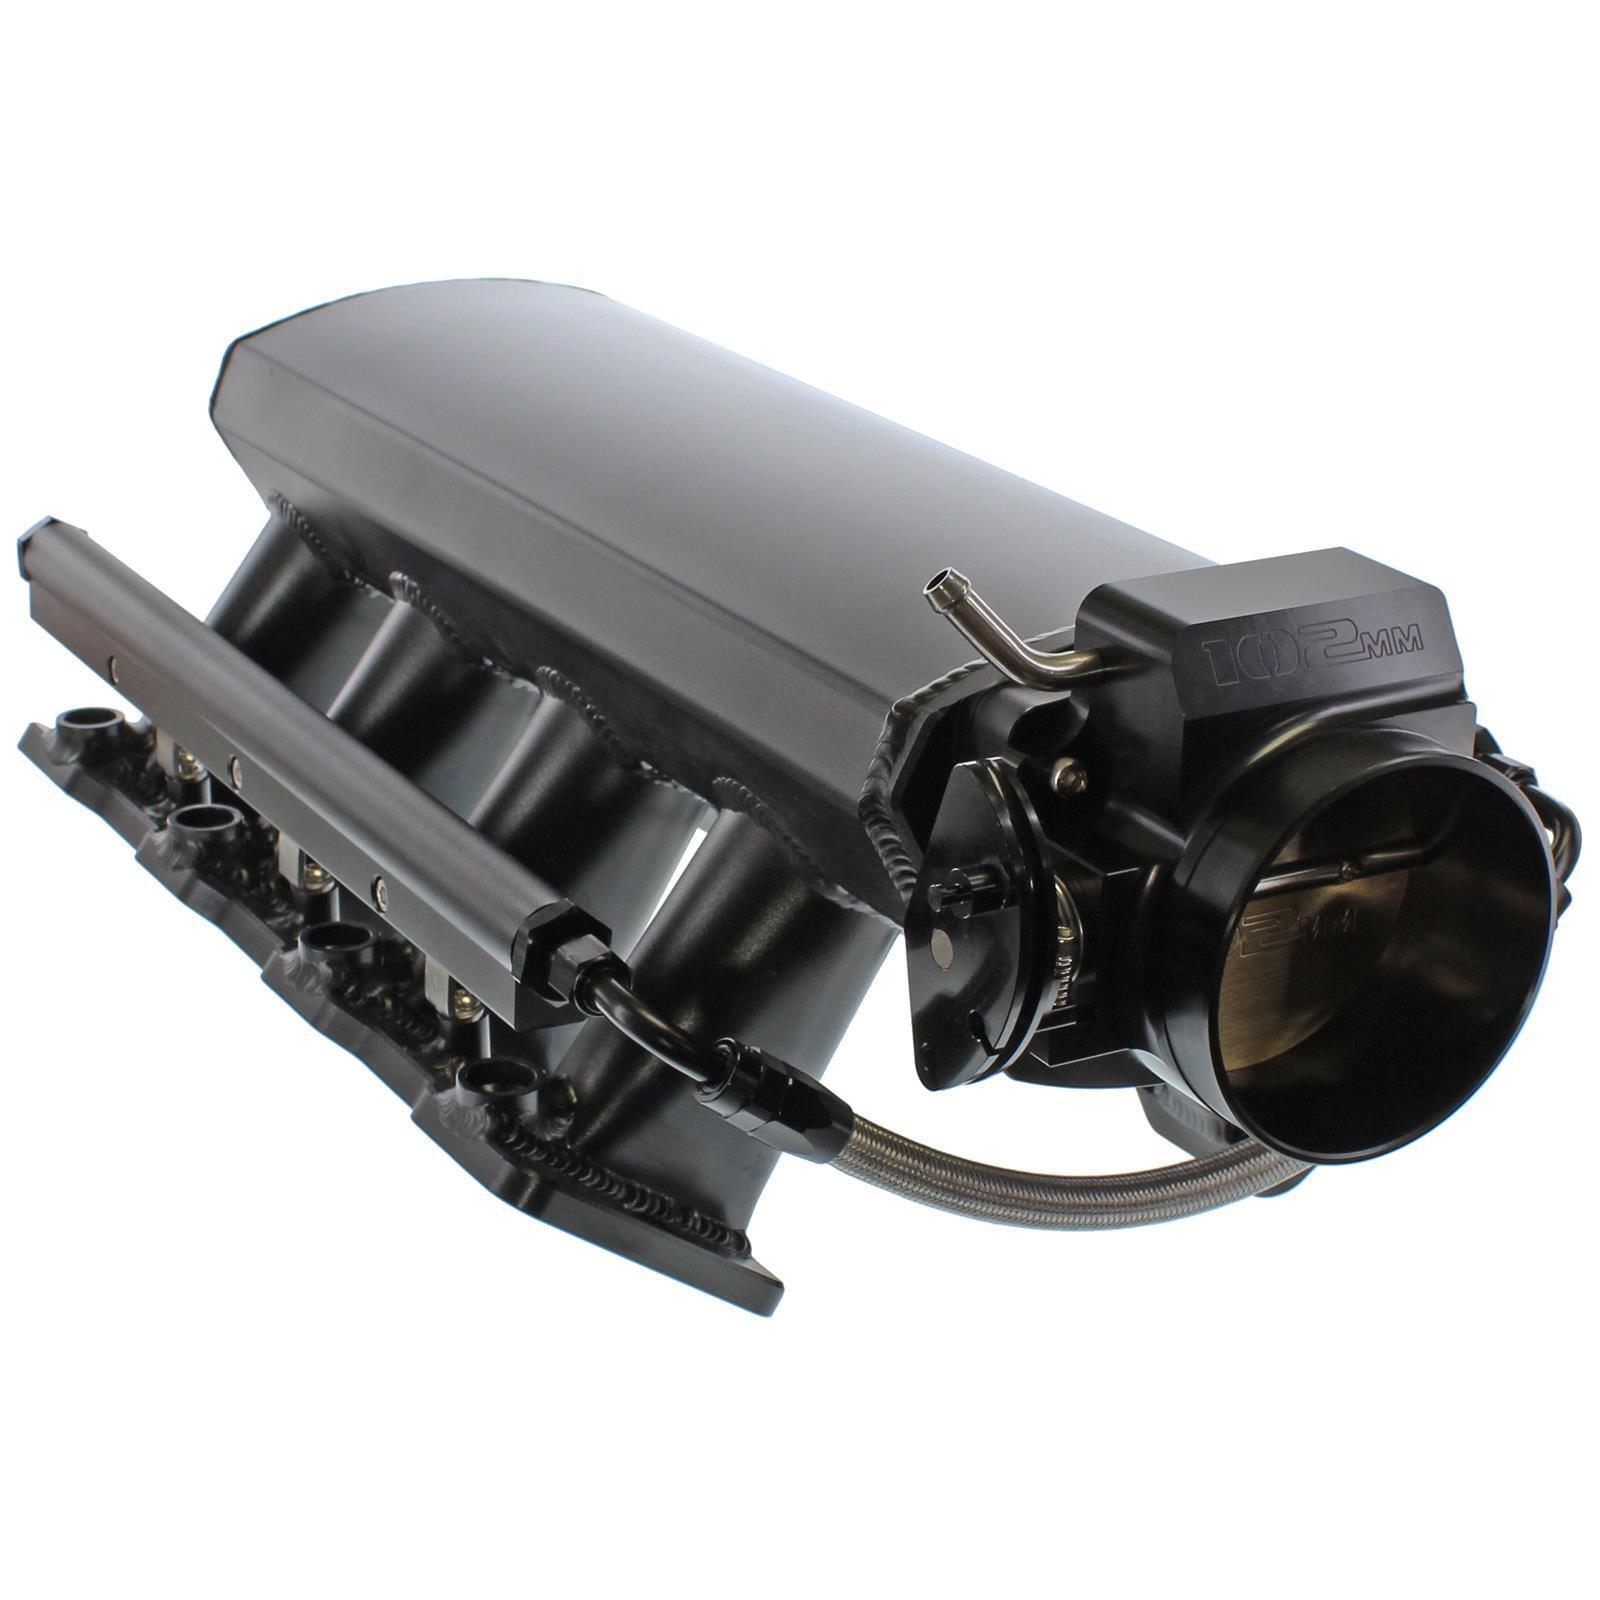 Ls6 Engine Horsepower: LS LSX LS1 LS2 LS6 Fabricated Intake Manifold Kit Throttle